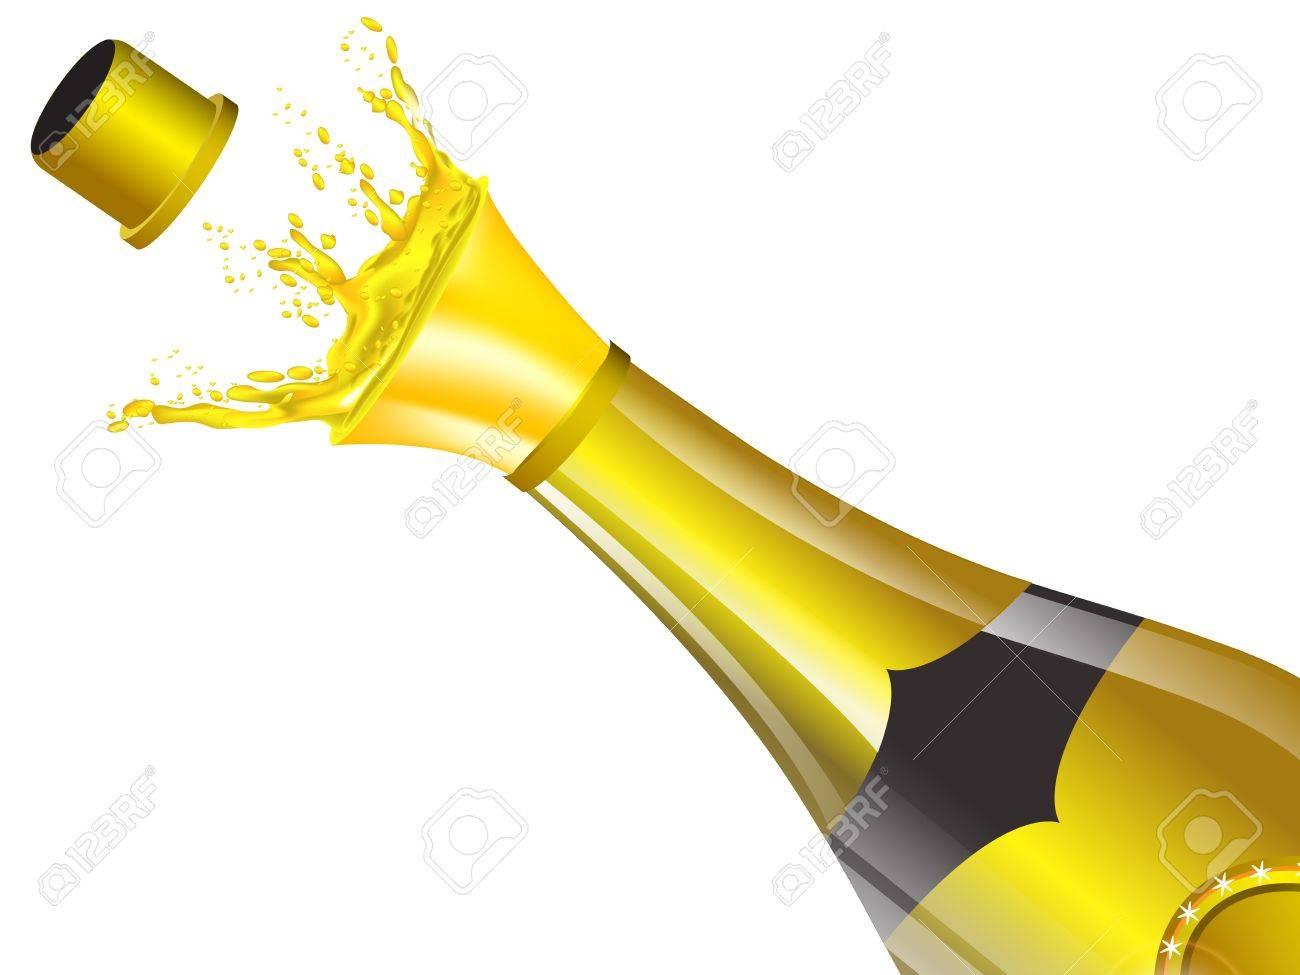 Champagne Bottle Png Background Image - Champagne Bottle Transparent  Background Clipart (#443409) - PikPng